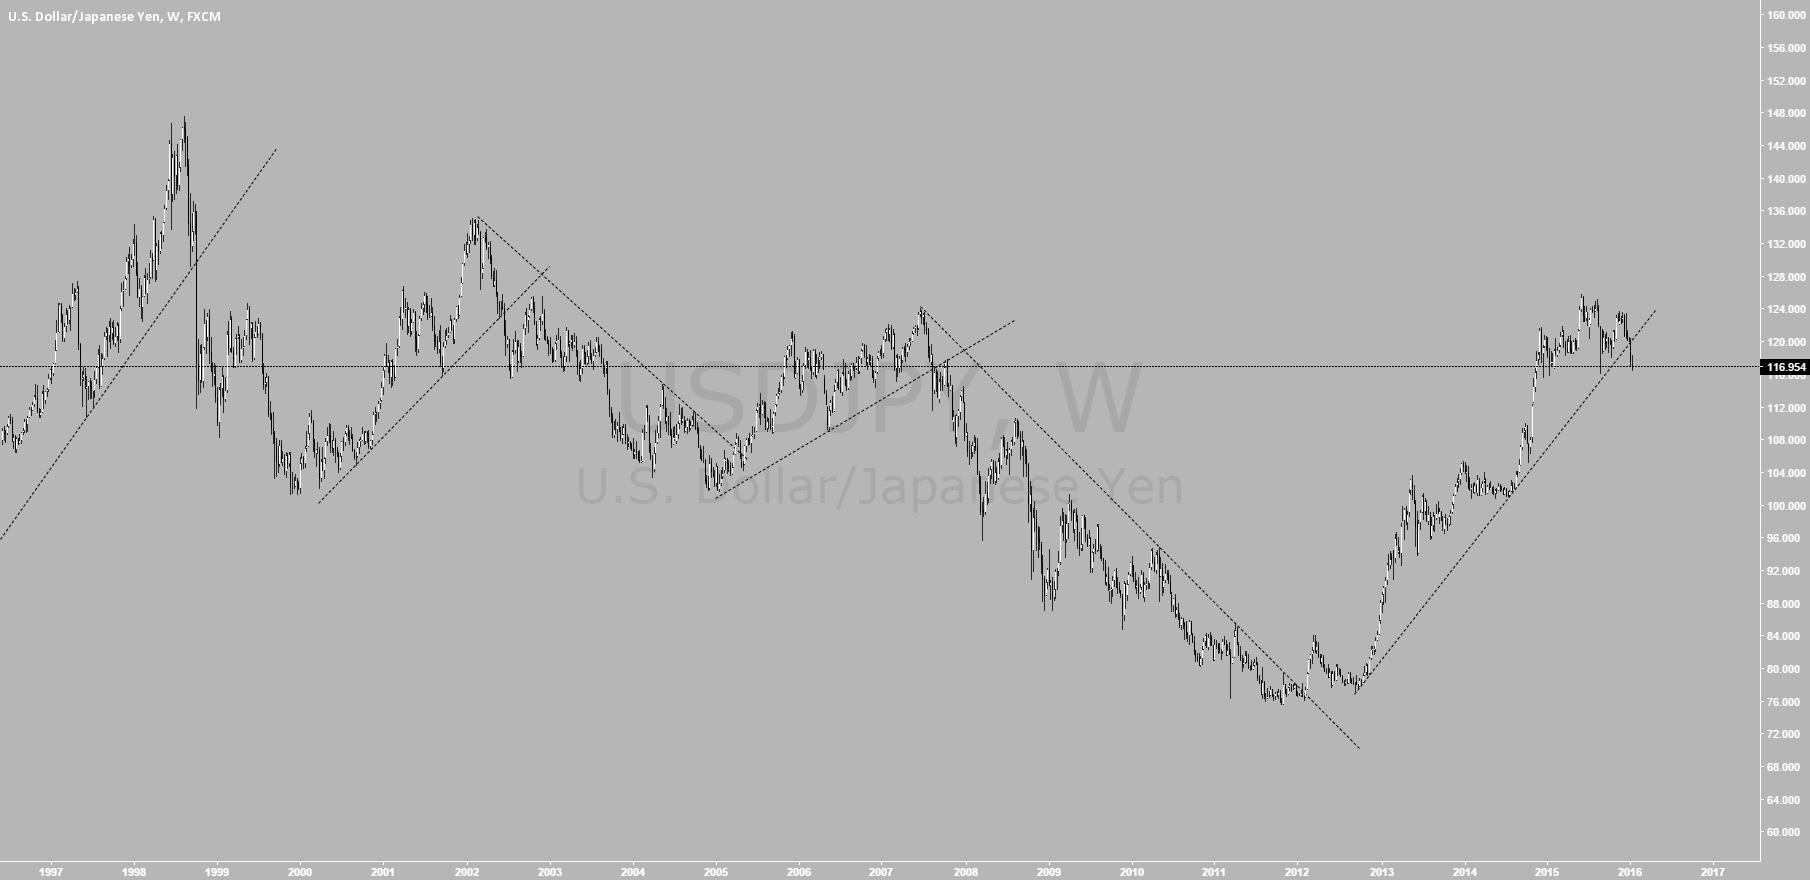 usdjpy, weekly, simple  trendline breakout trades.